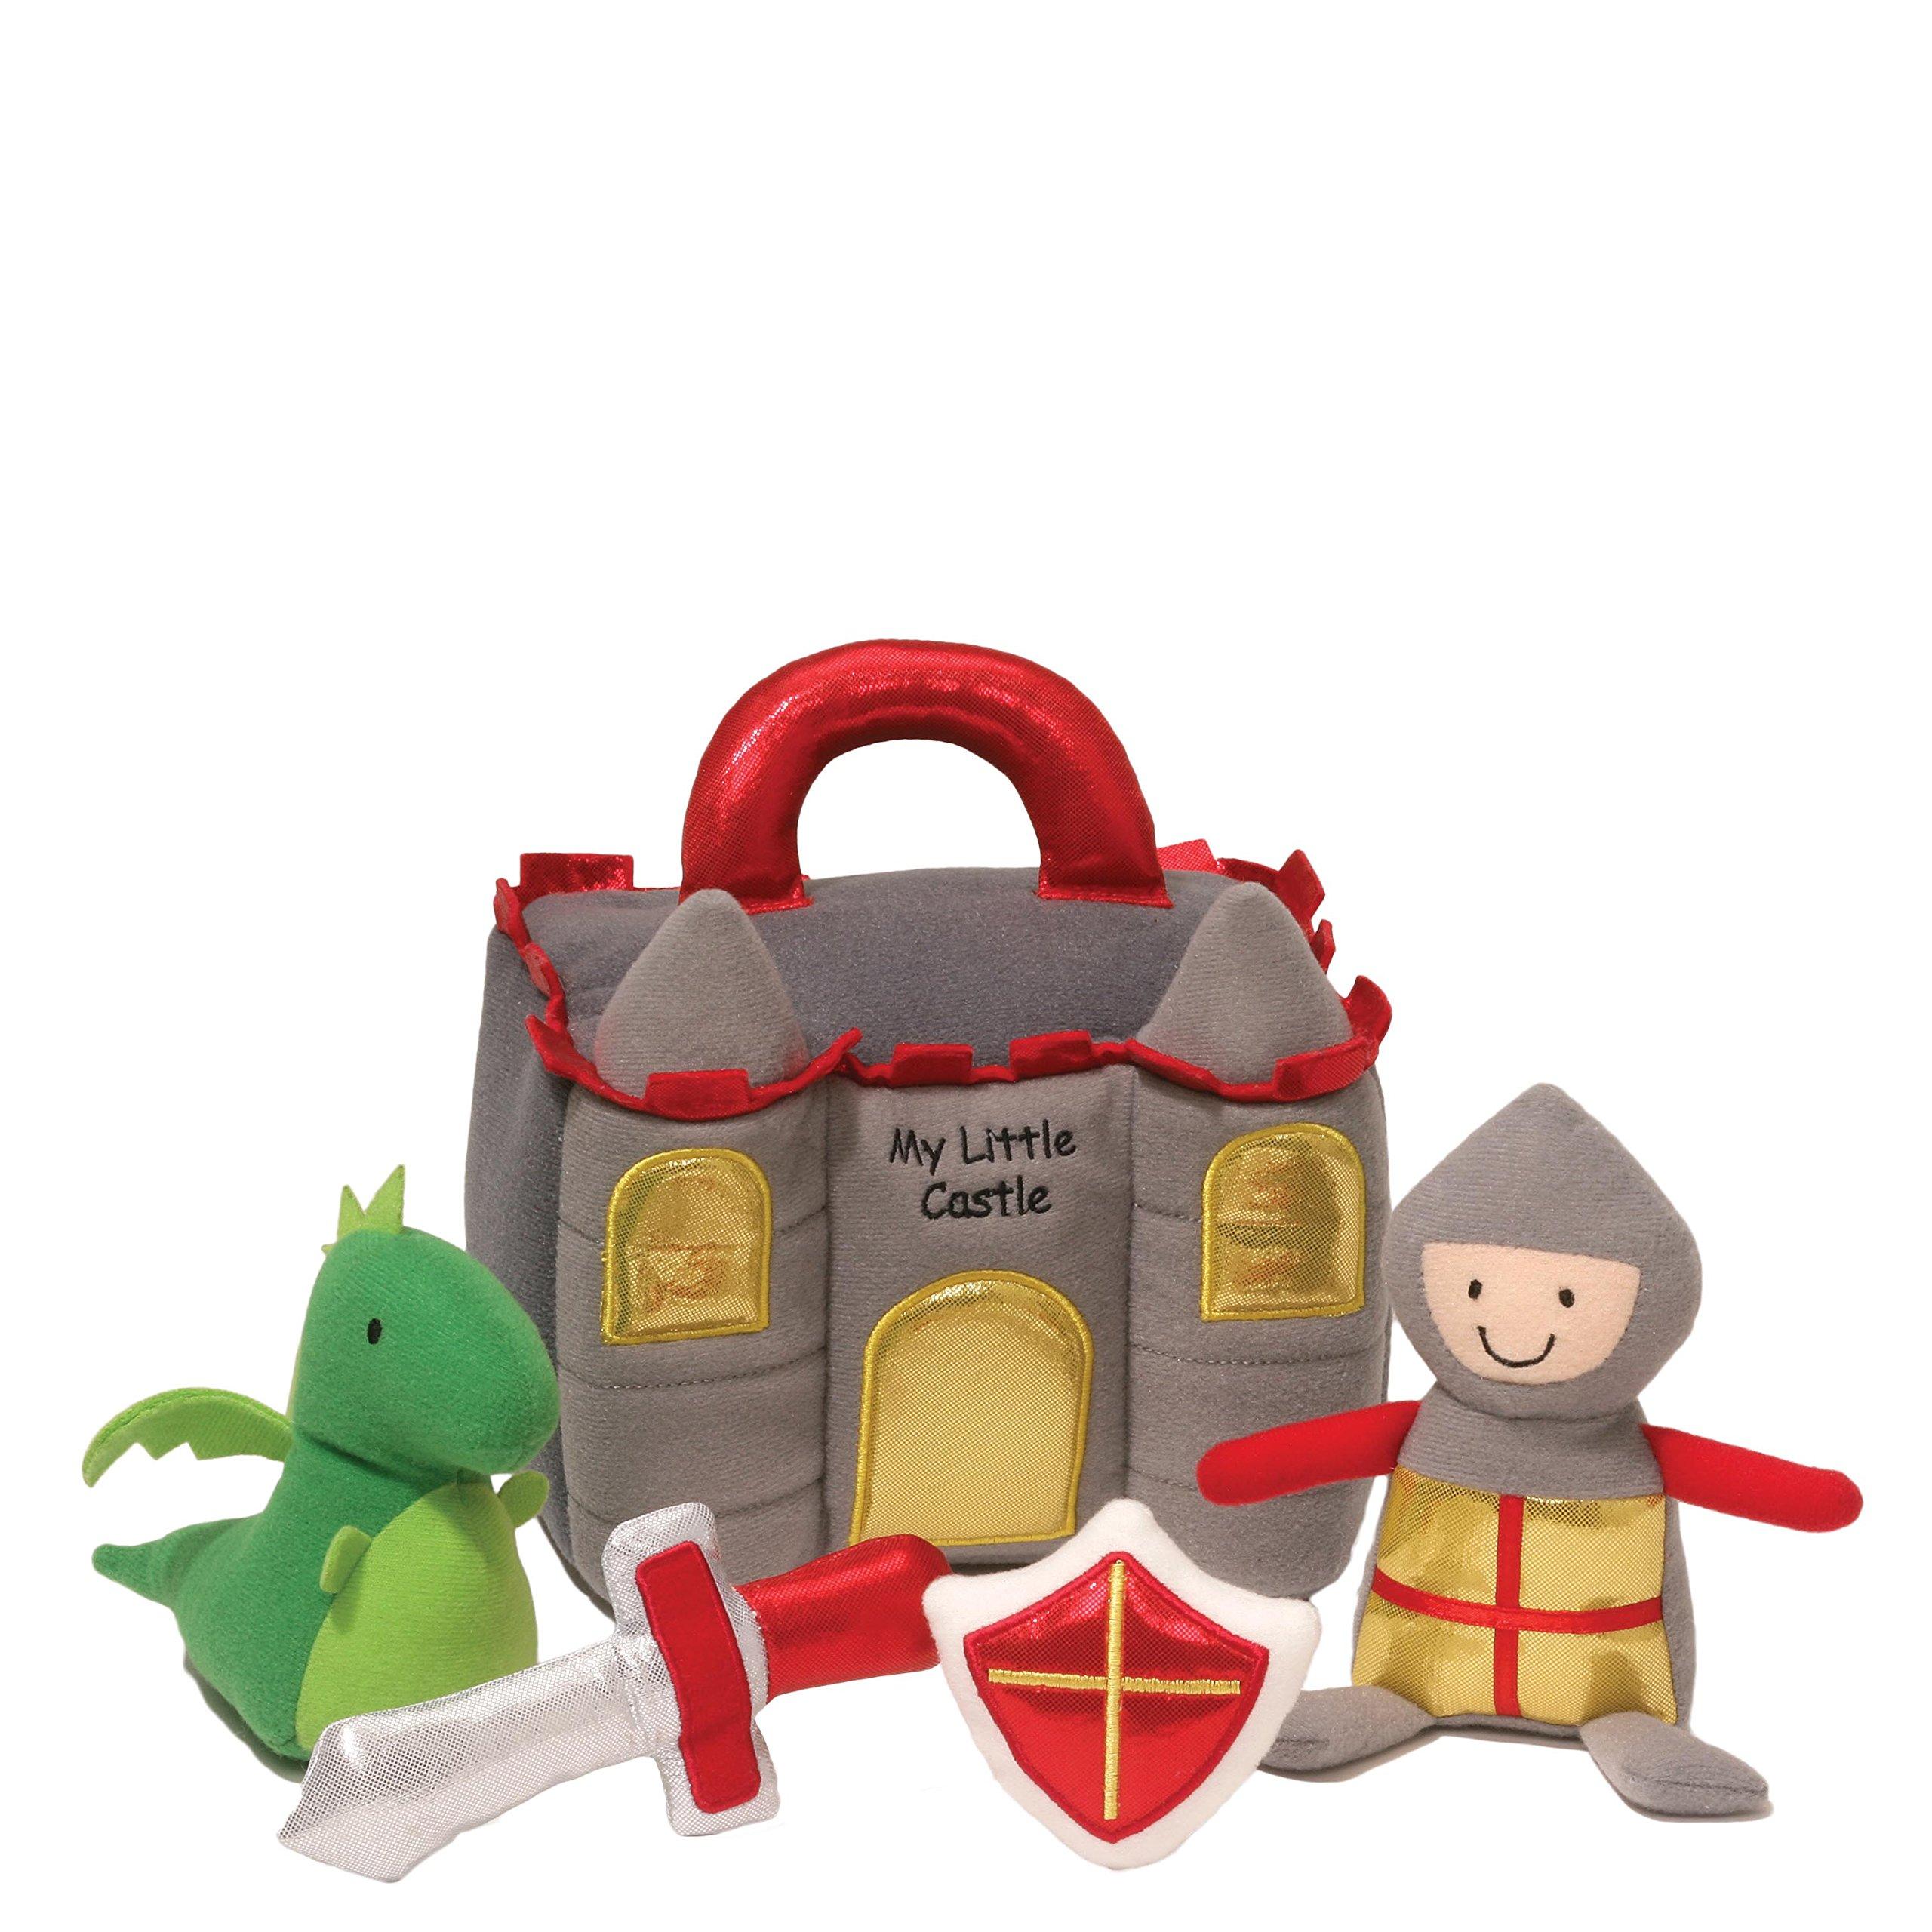 "Baby GUND My Little Castle Stuffed Plush Playset, 8"""